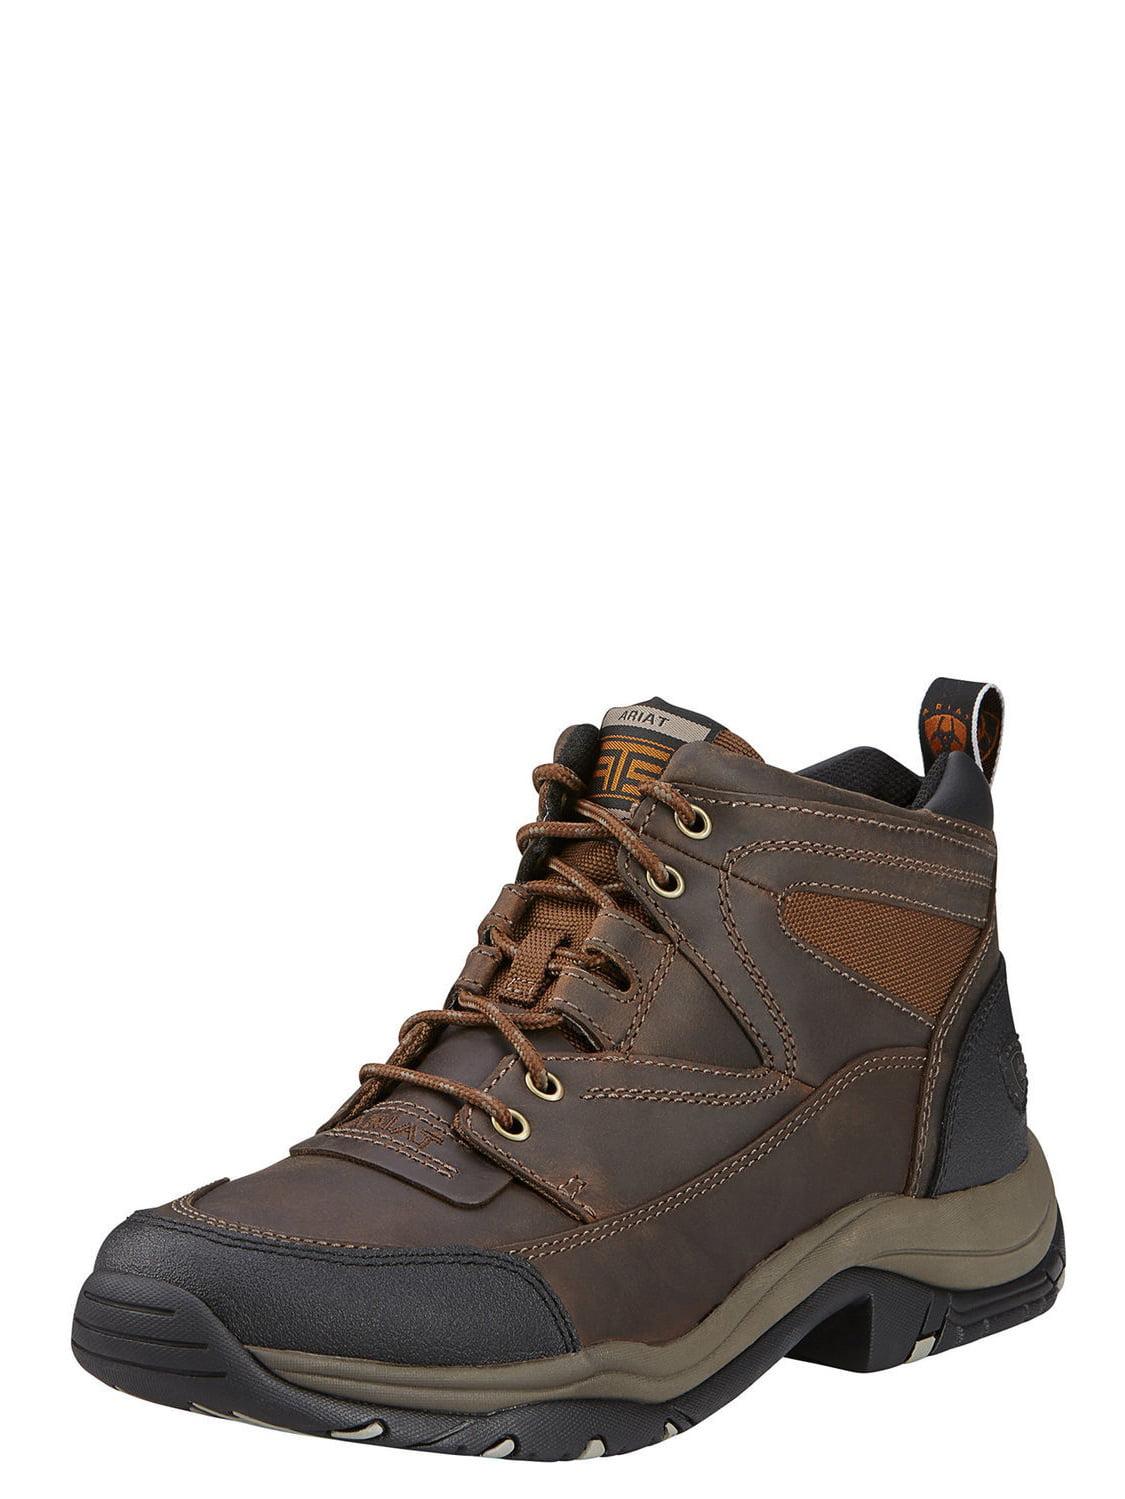 Ariat International Inc. Mens Distressed Brown Terrain Shoe by ARIAT INTERNATIONAL INC.